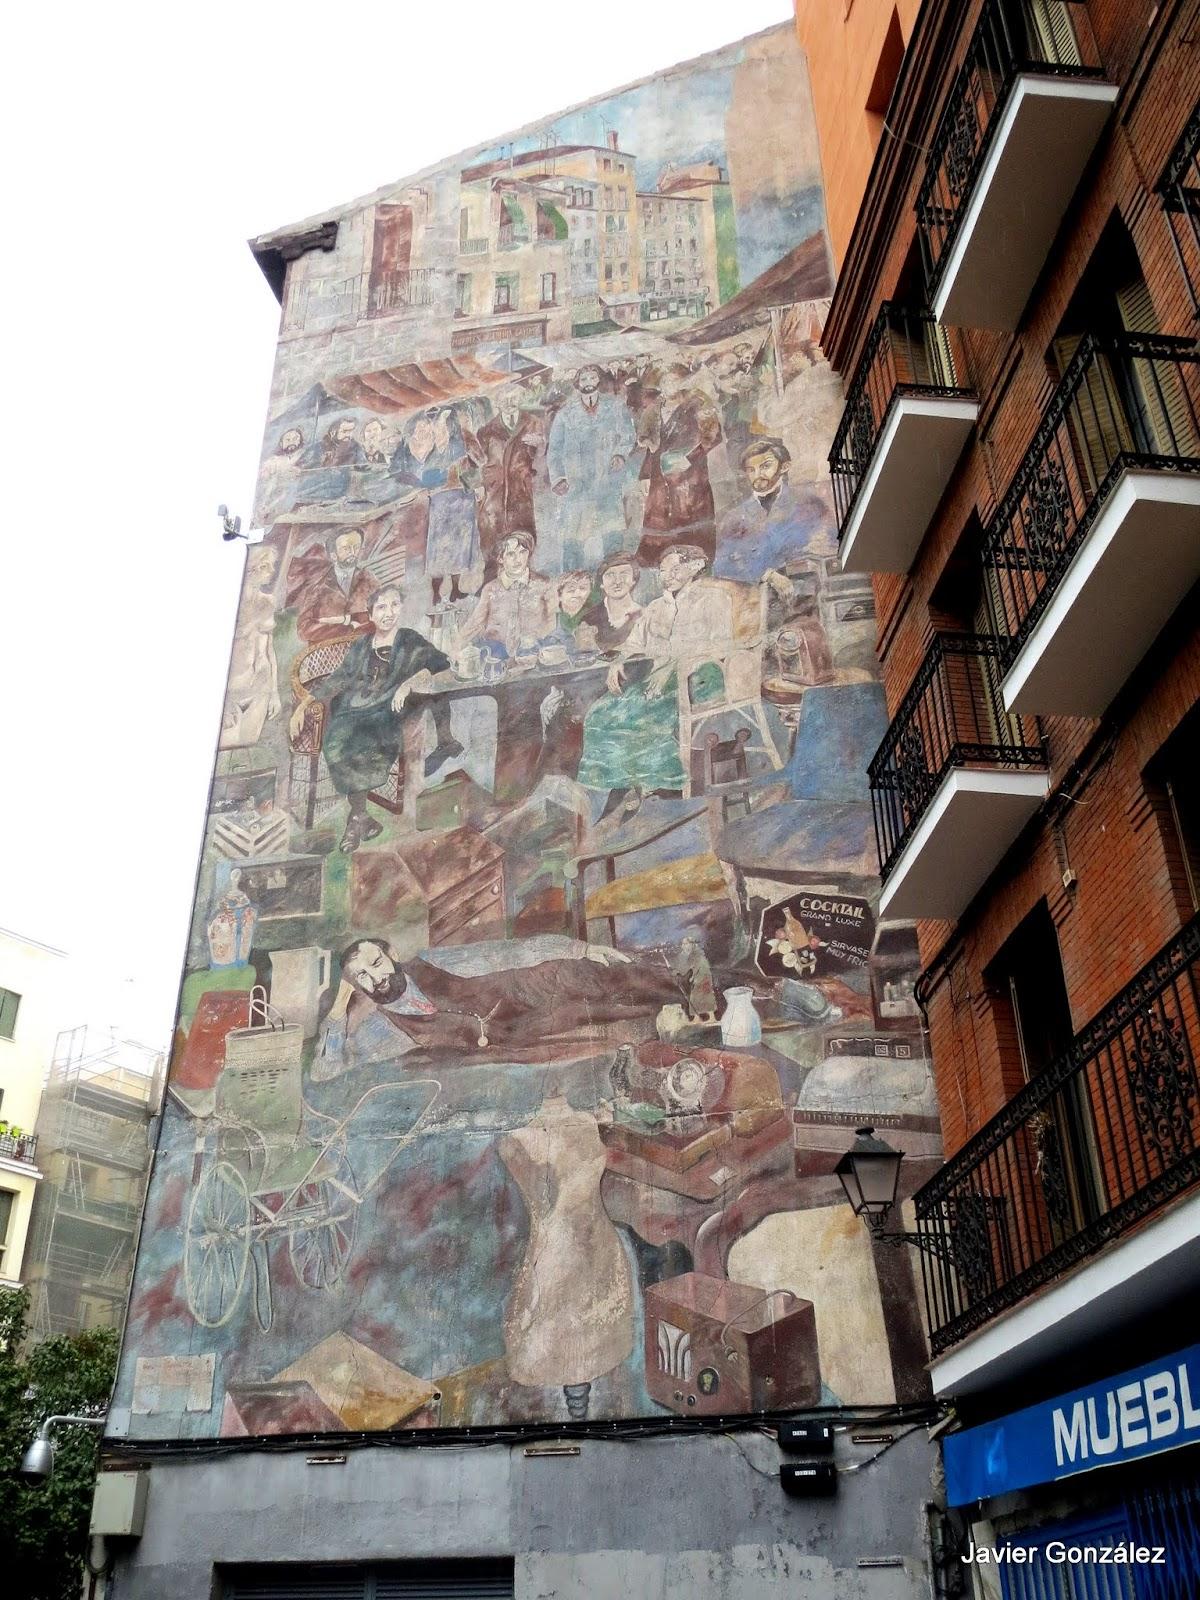 Ribera de curtidores. Mural. #cityscapes